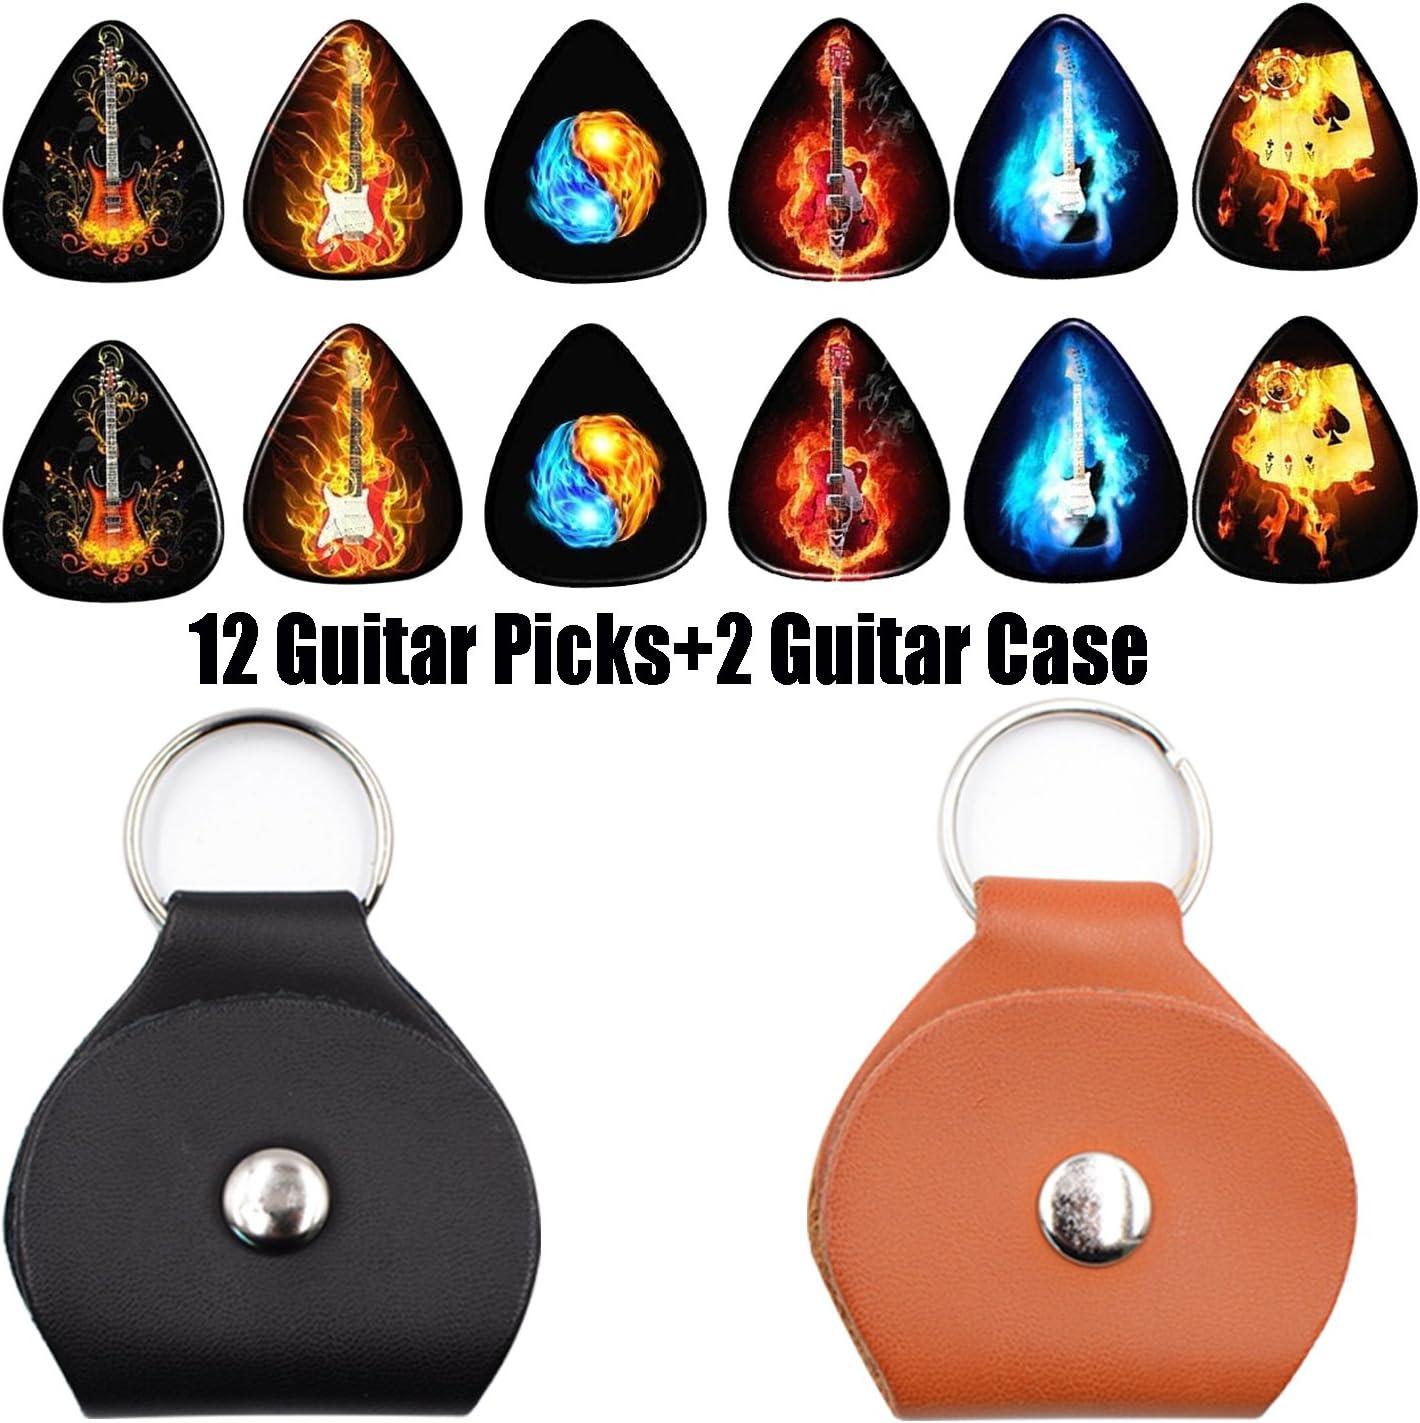 Guitar Picks 0.46 mm 12 Pack,2 Pack Picks Holder Case - Leather(Flame guitar Series)